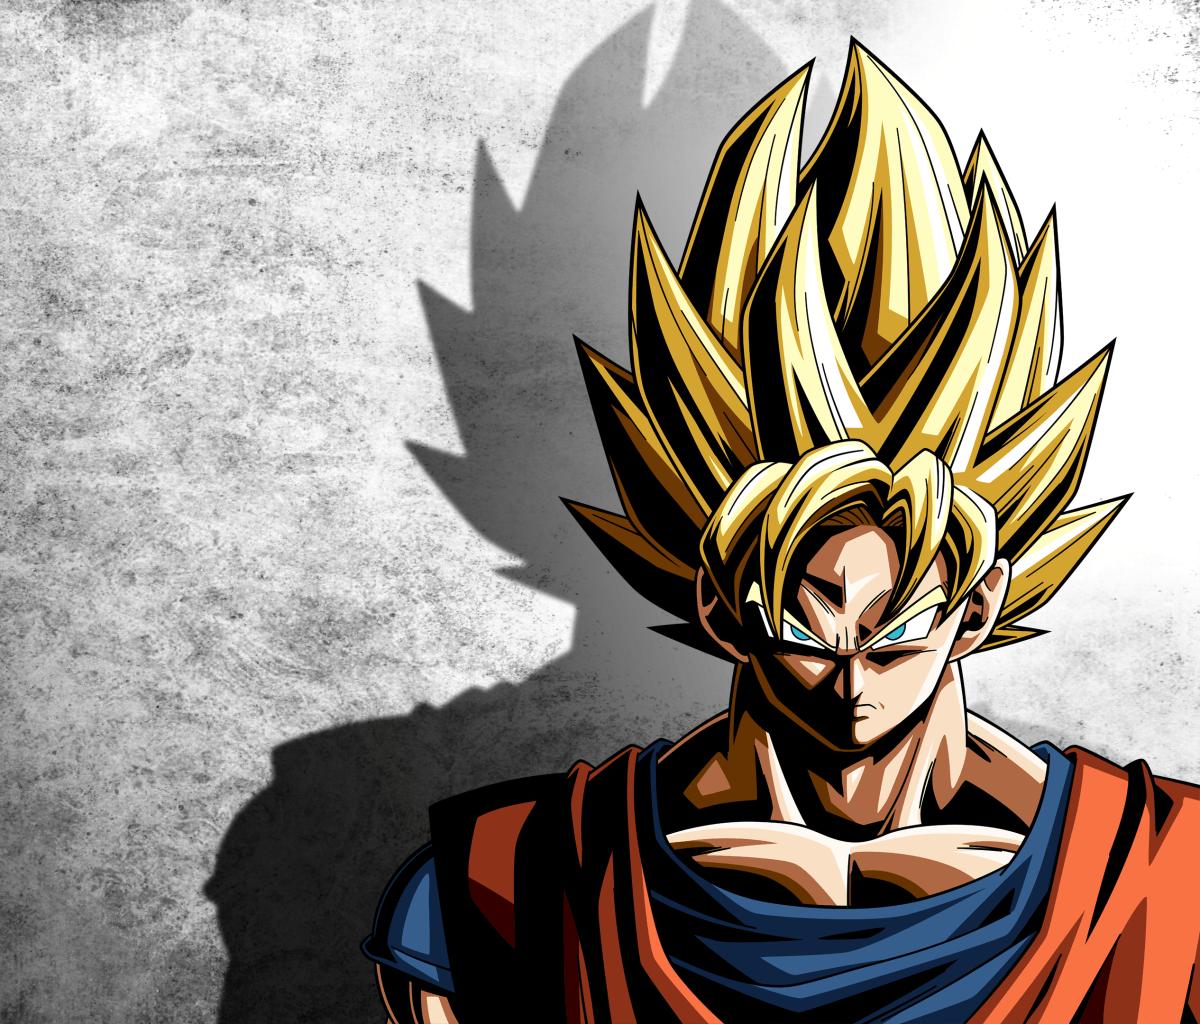 Anime/Dragon Ball Z (1200x1024) Wallpaper ID: 647720 - Mobile Abyss